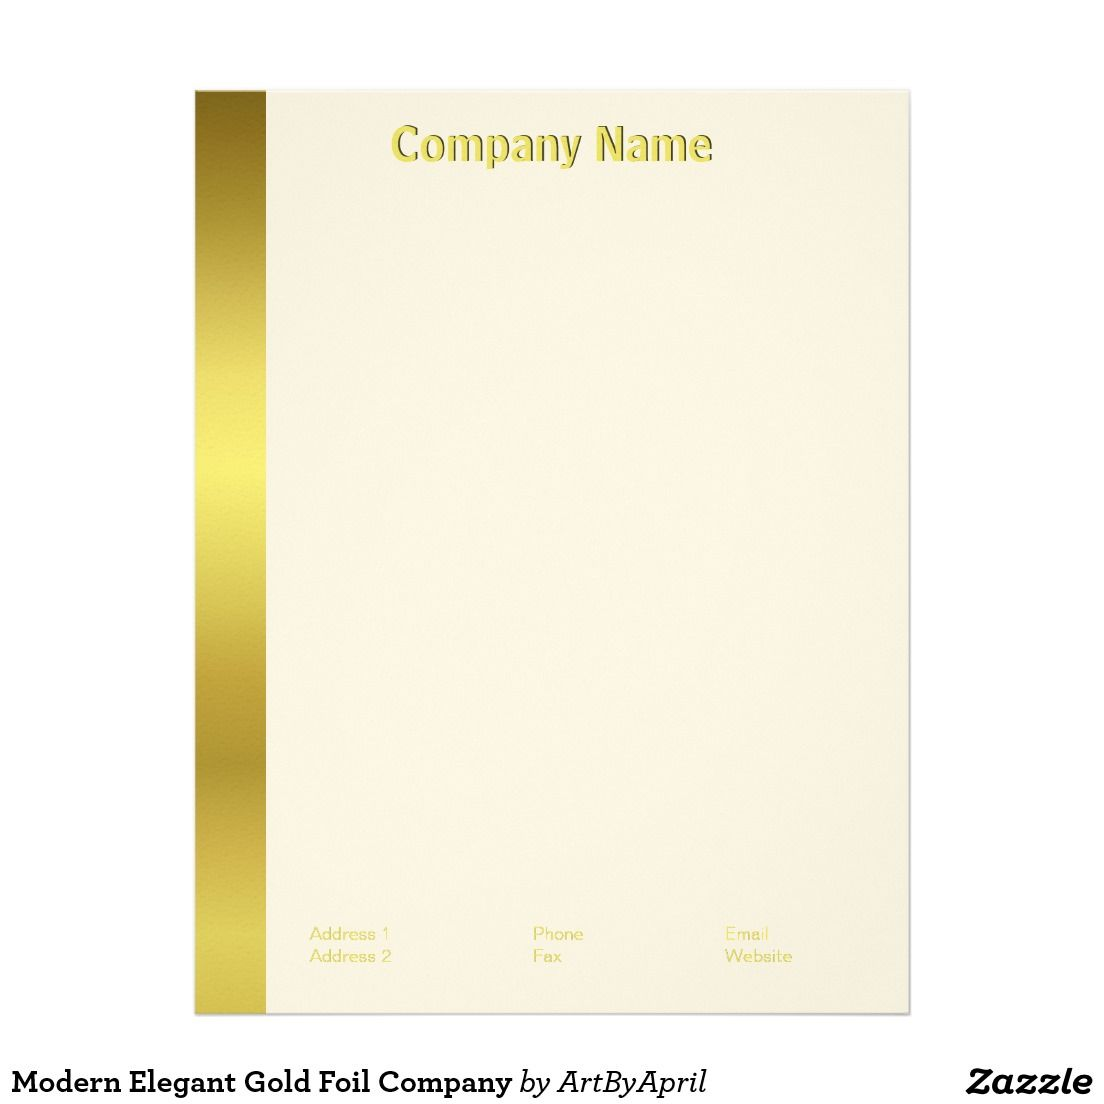 Modern Elegant Gold Foil Company Letterhead  Company Letterhead